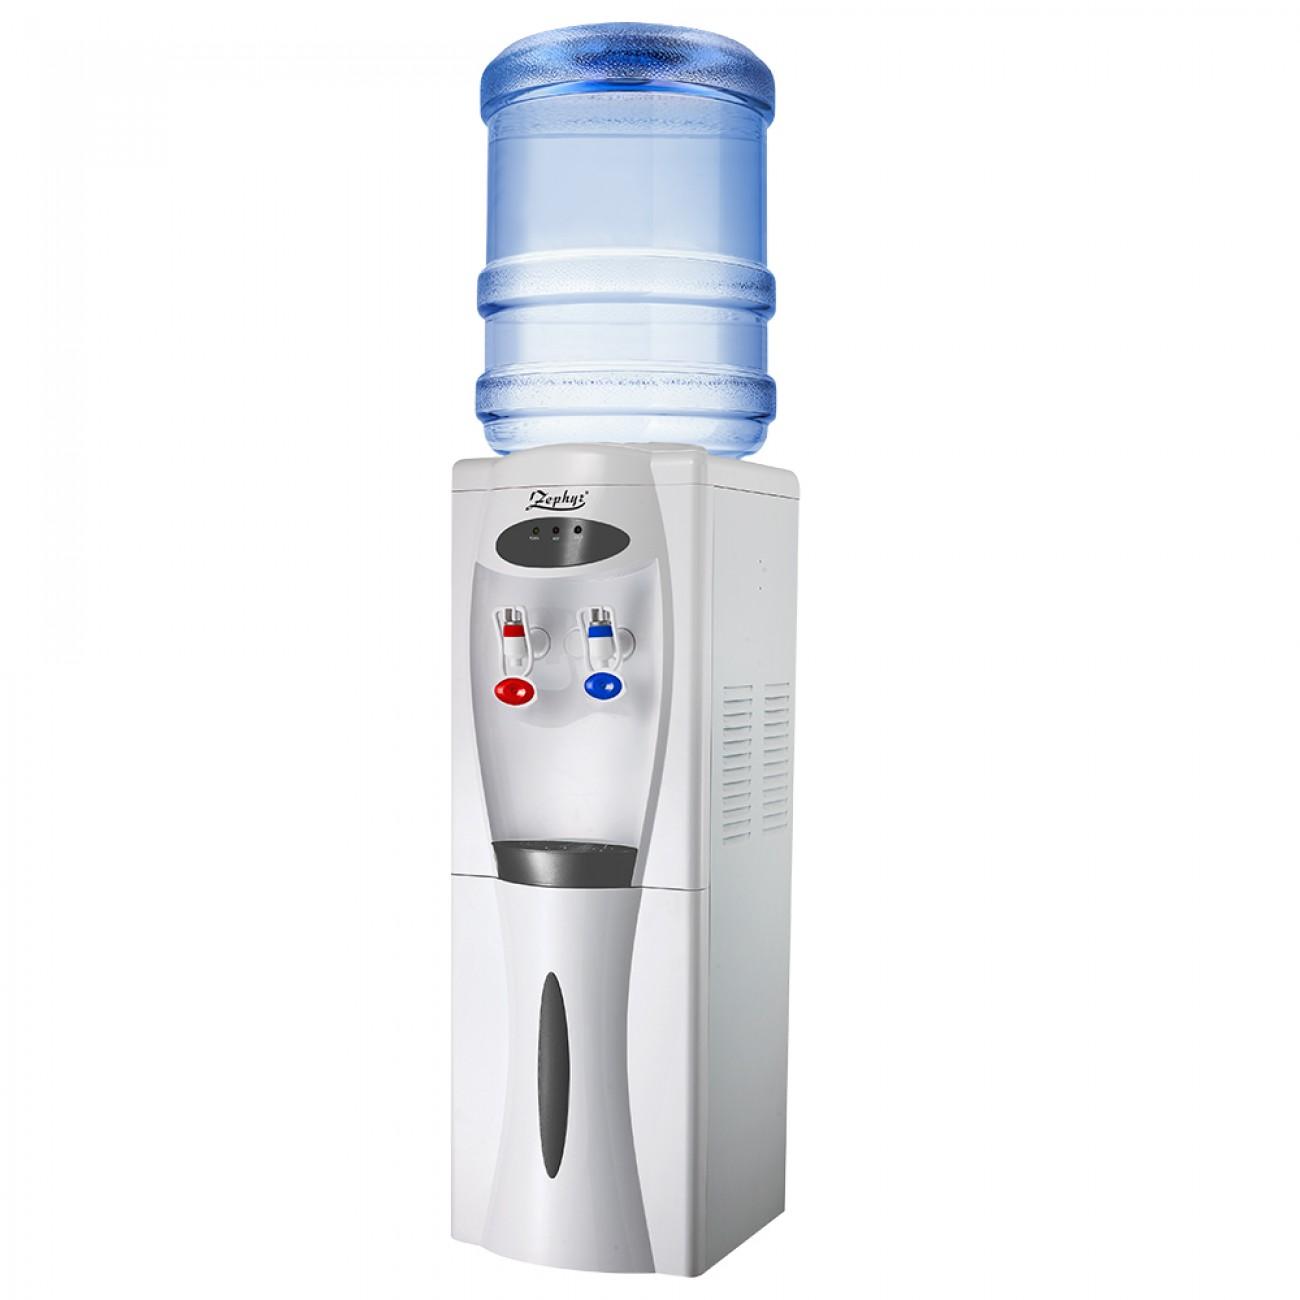 Диспенсър за вода с компресорно охлаждане ZEPHYR ZP 1449 ACB,  Загряване: 500W, Охлаждане: 120W, Бял в Диспенсъри за вода - ZEPHYR | Alleop